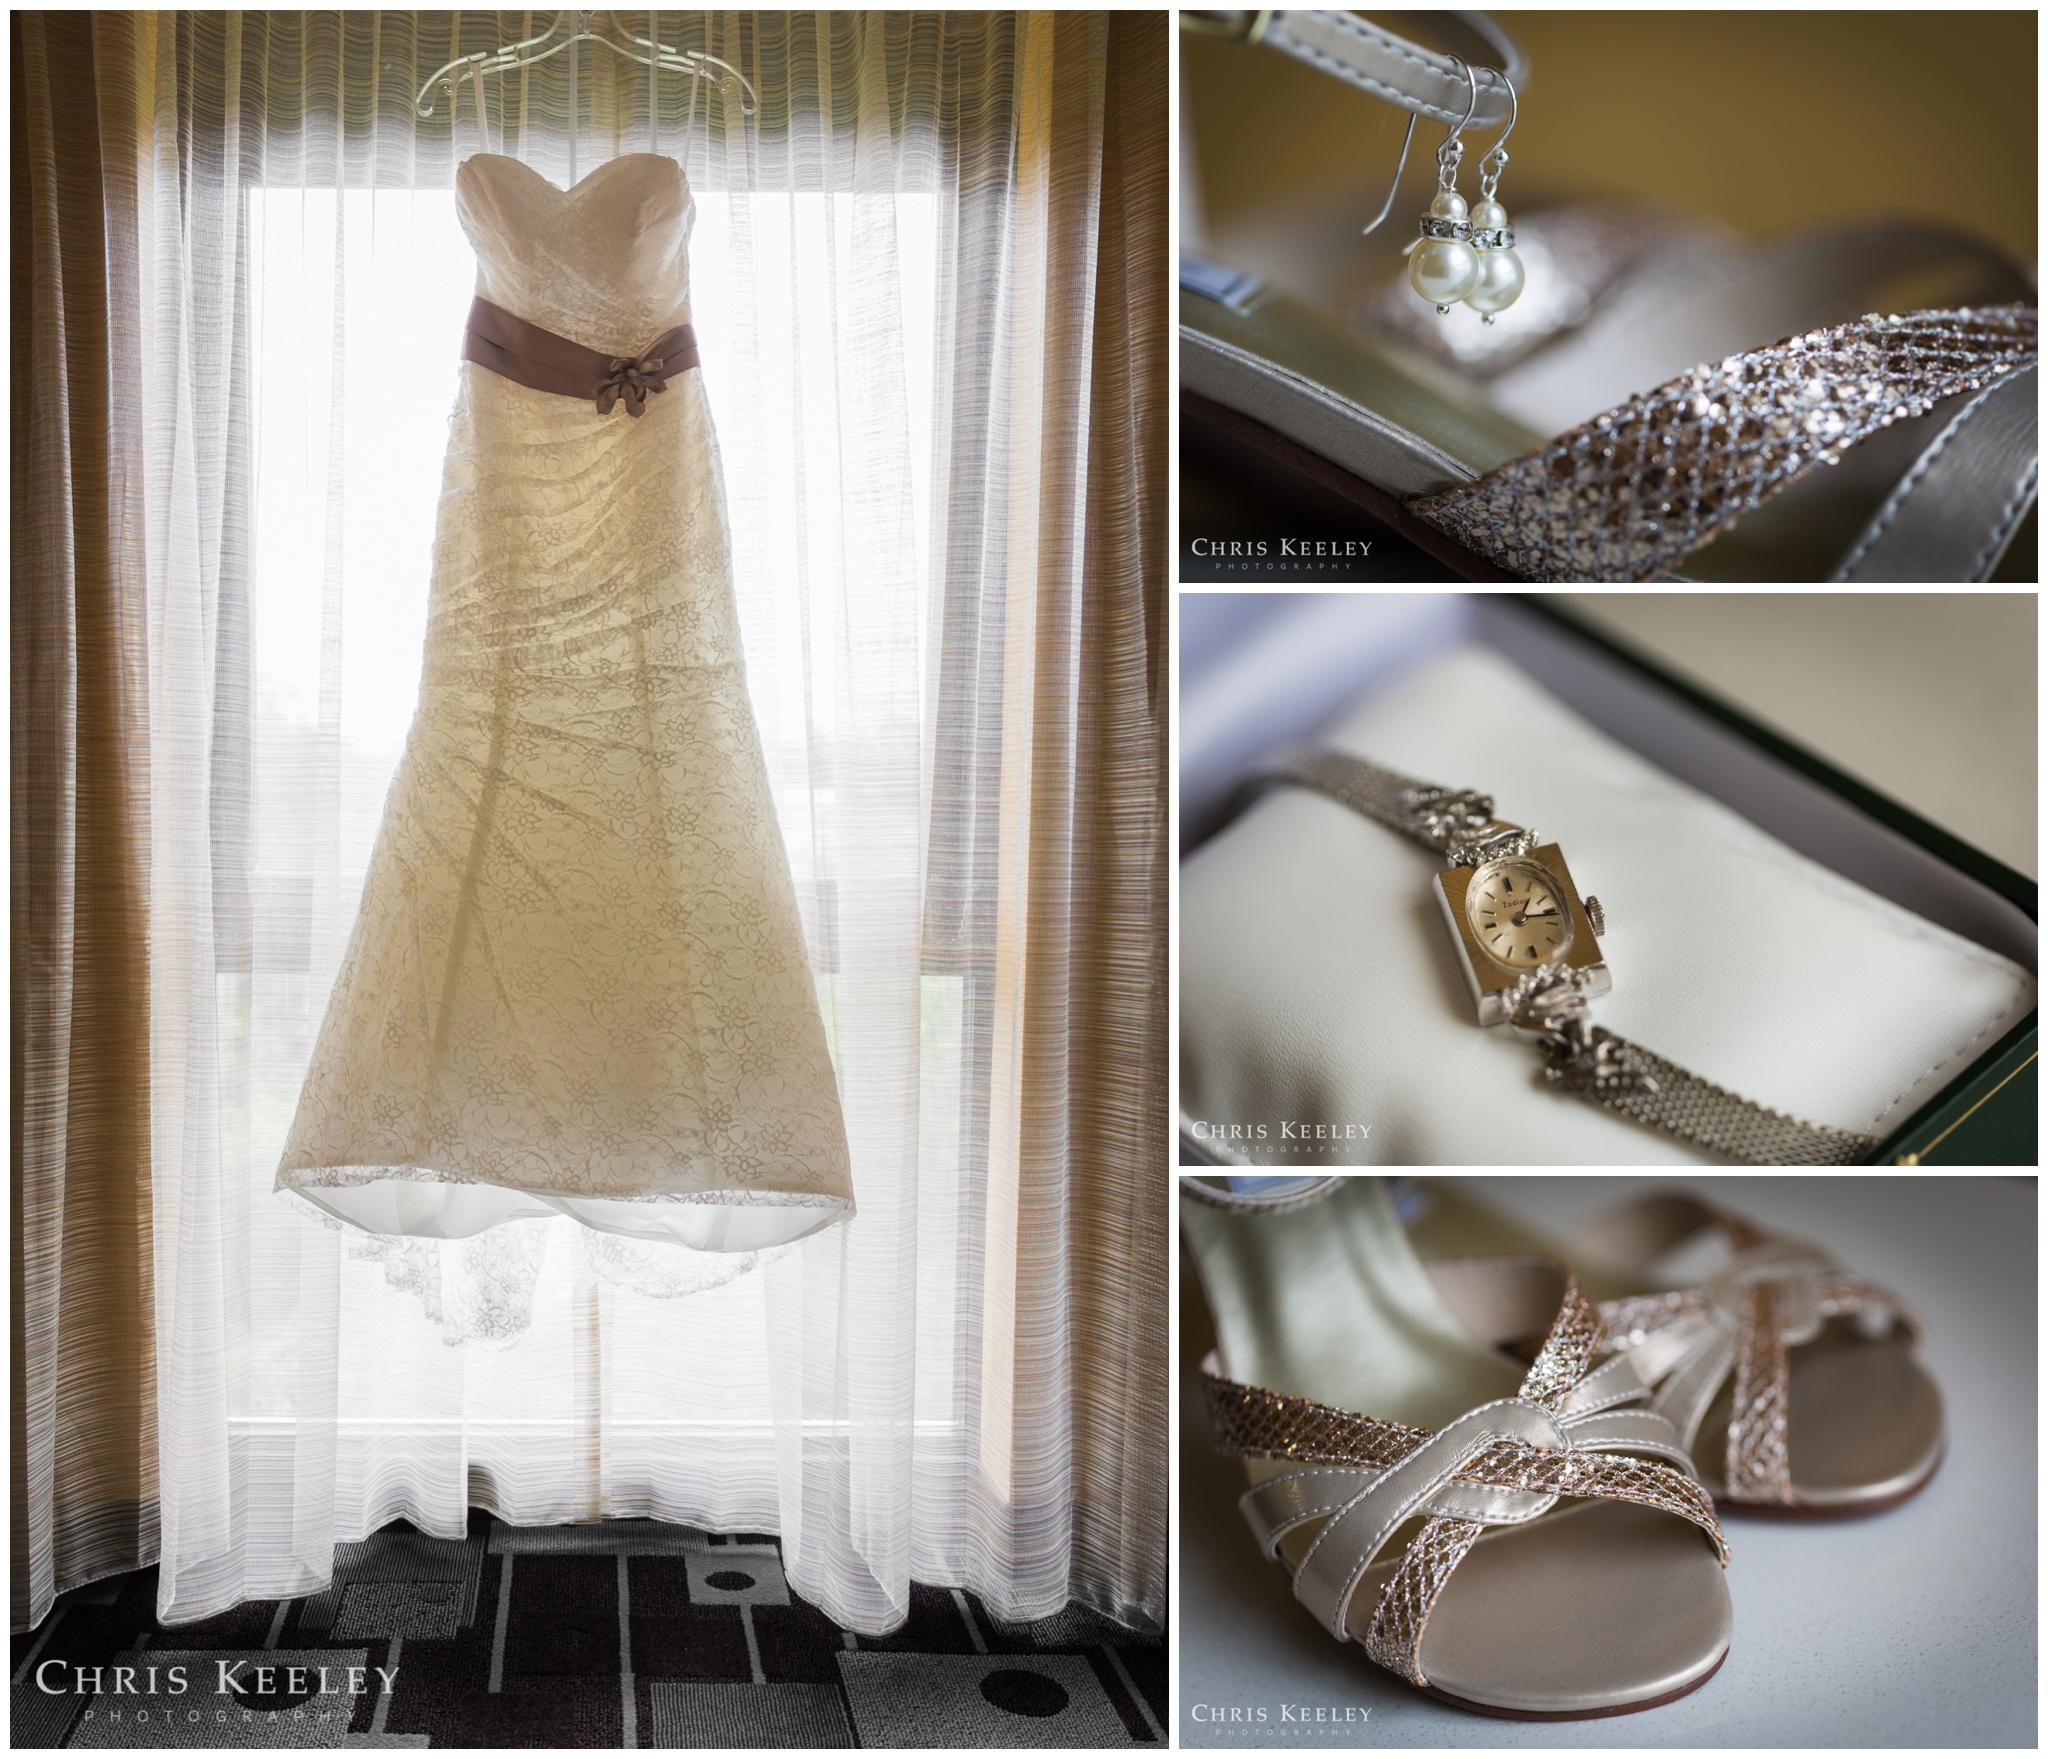 portsmouth-new-hampshire-fall-wedding-chris-keeley-photography-03-2.jpg